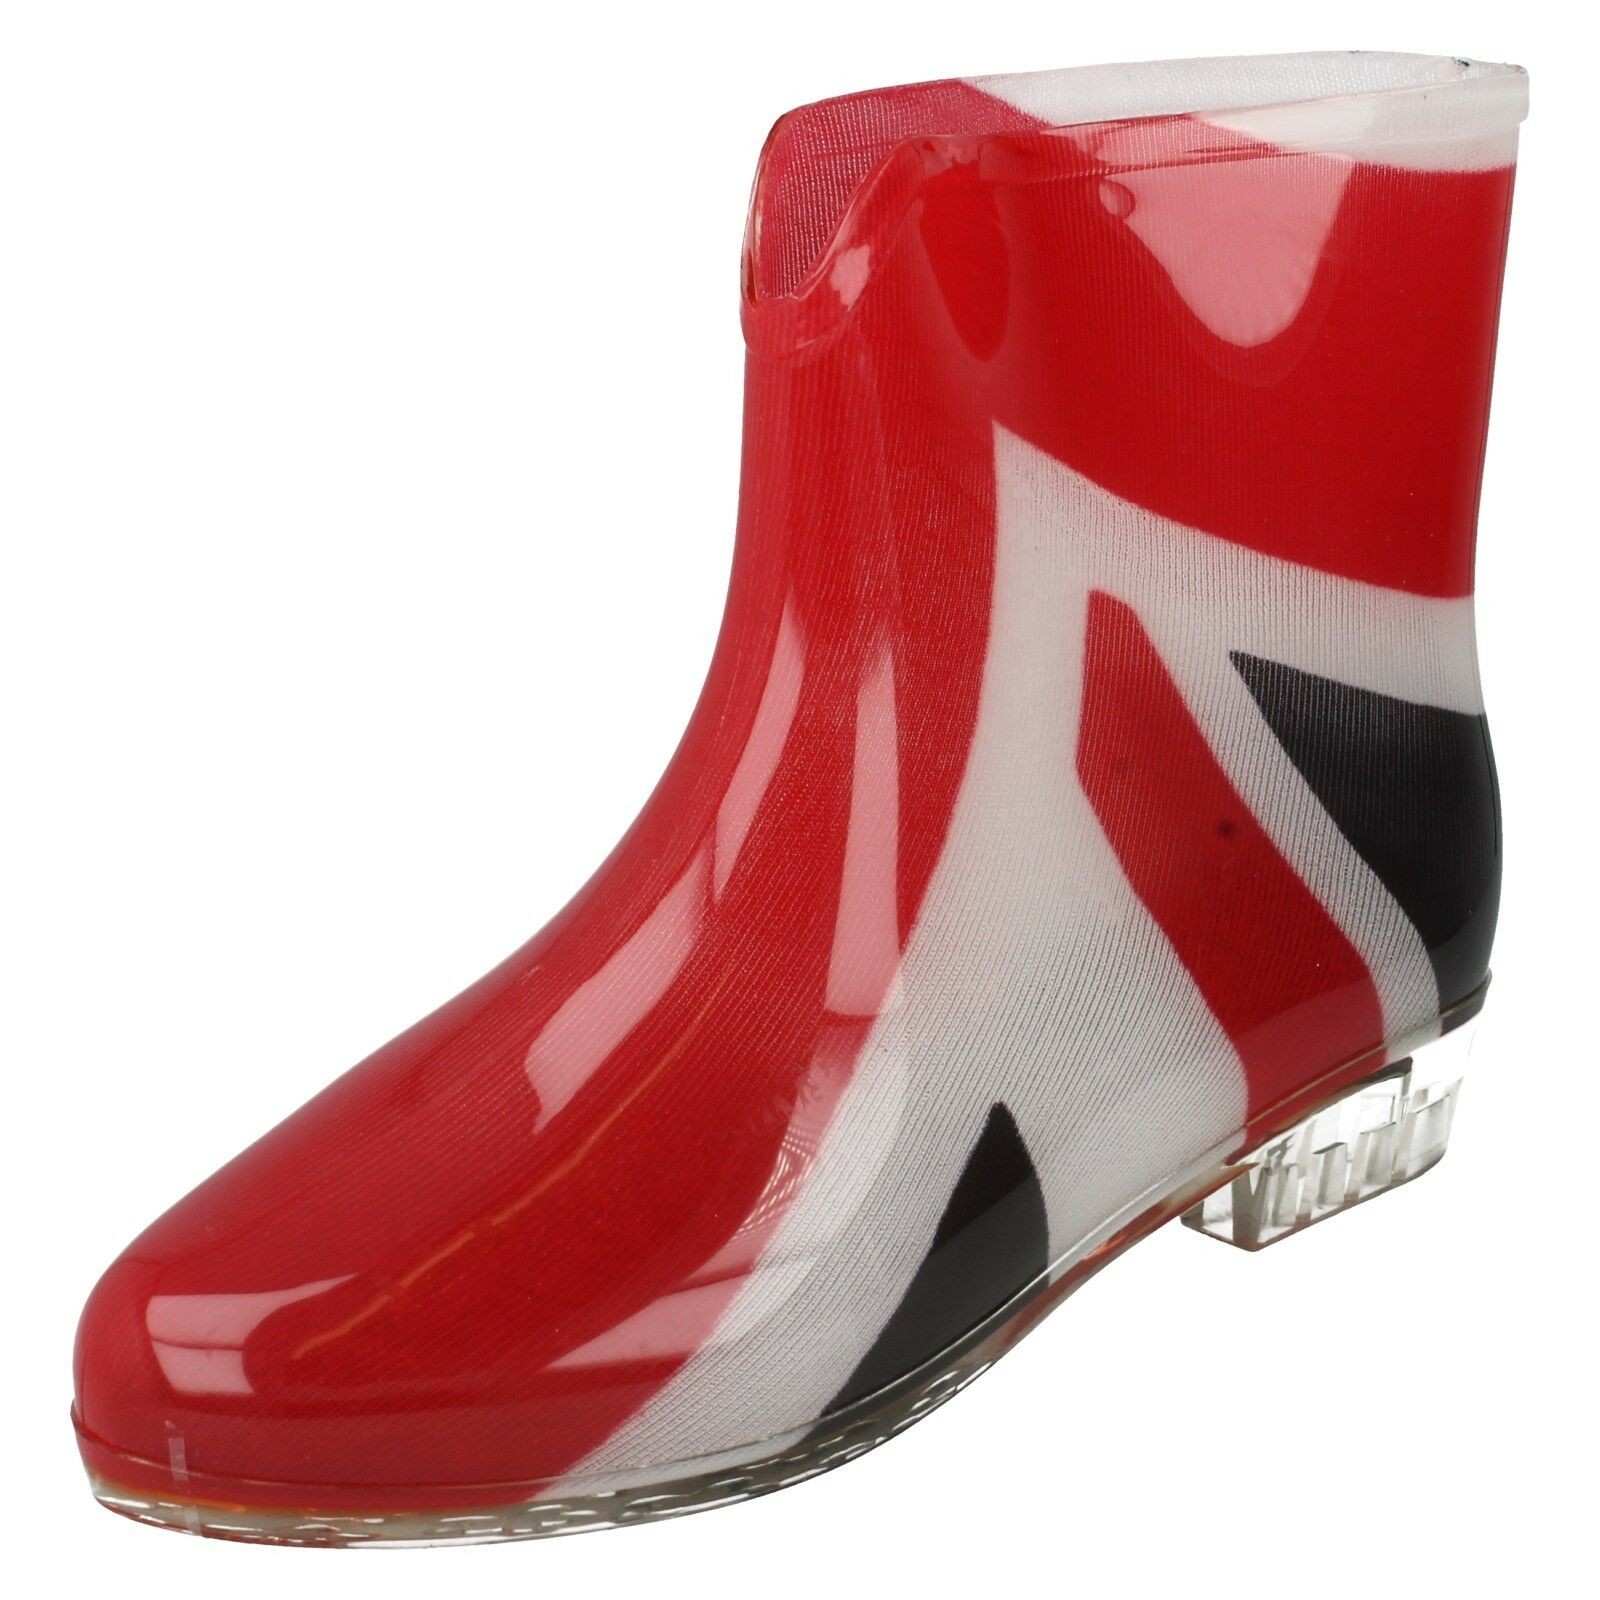 LADIES RAIN WATERPROOF UNION FLAG PRINT ANKLE WELLIES WELLINGTON BOOTS X1195